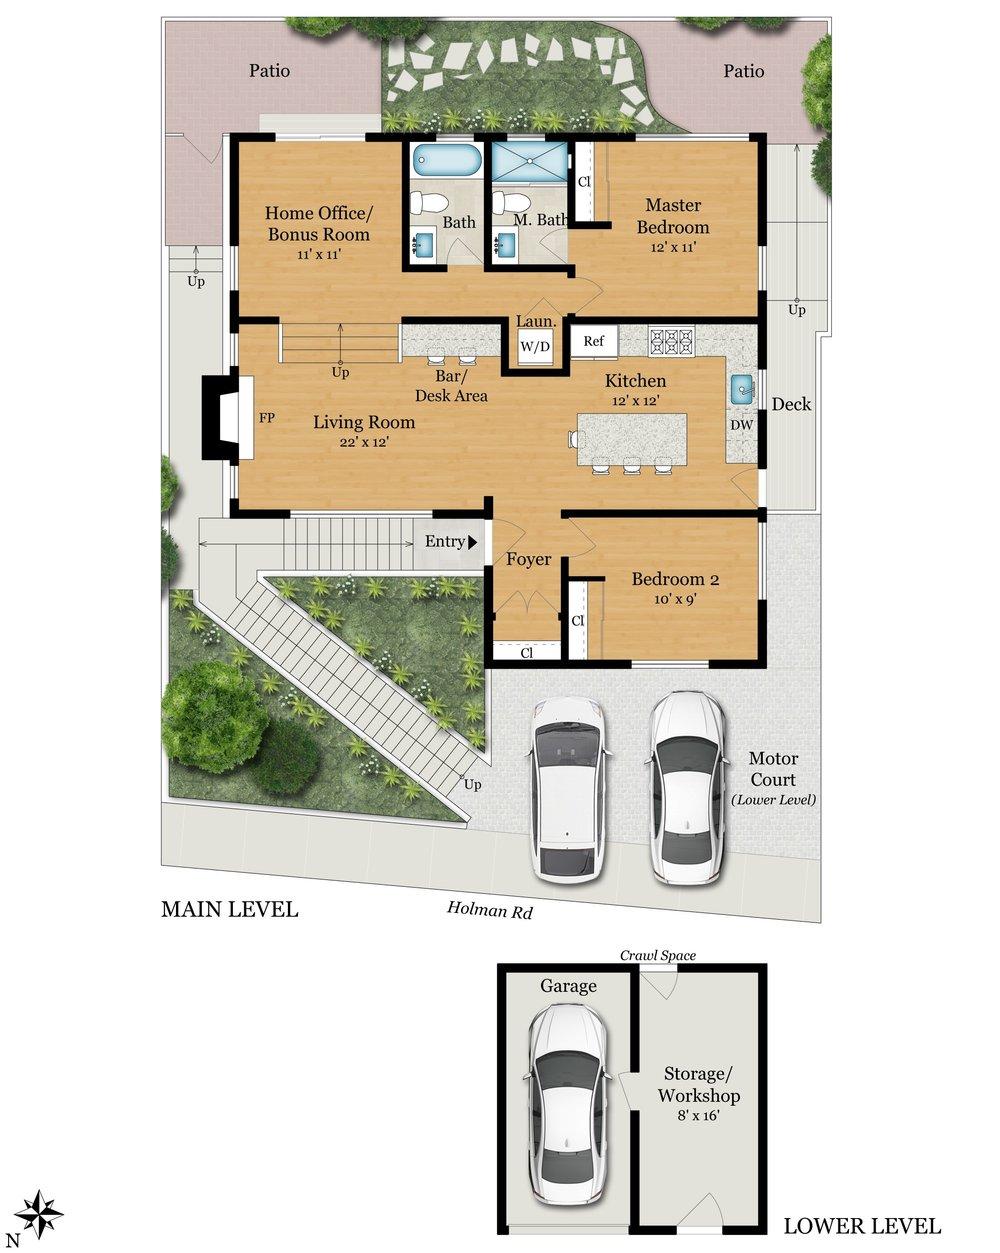 JM-1371HolmanRd-FloorPlan-Print-R1 (2).jpg